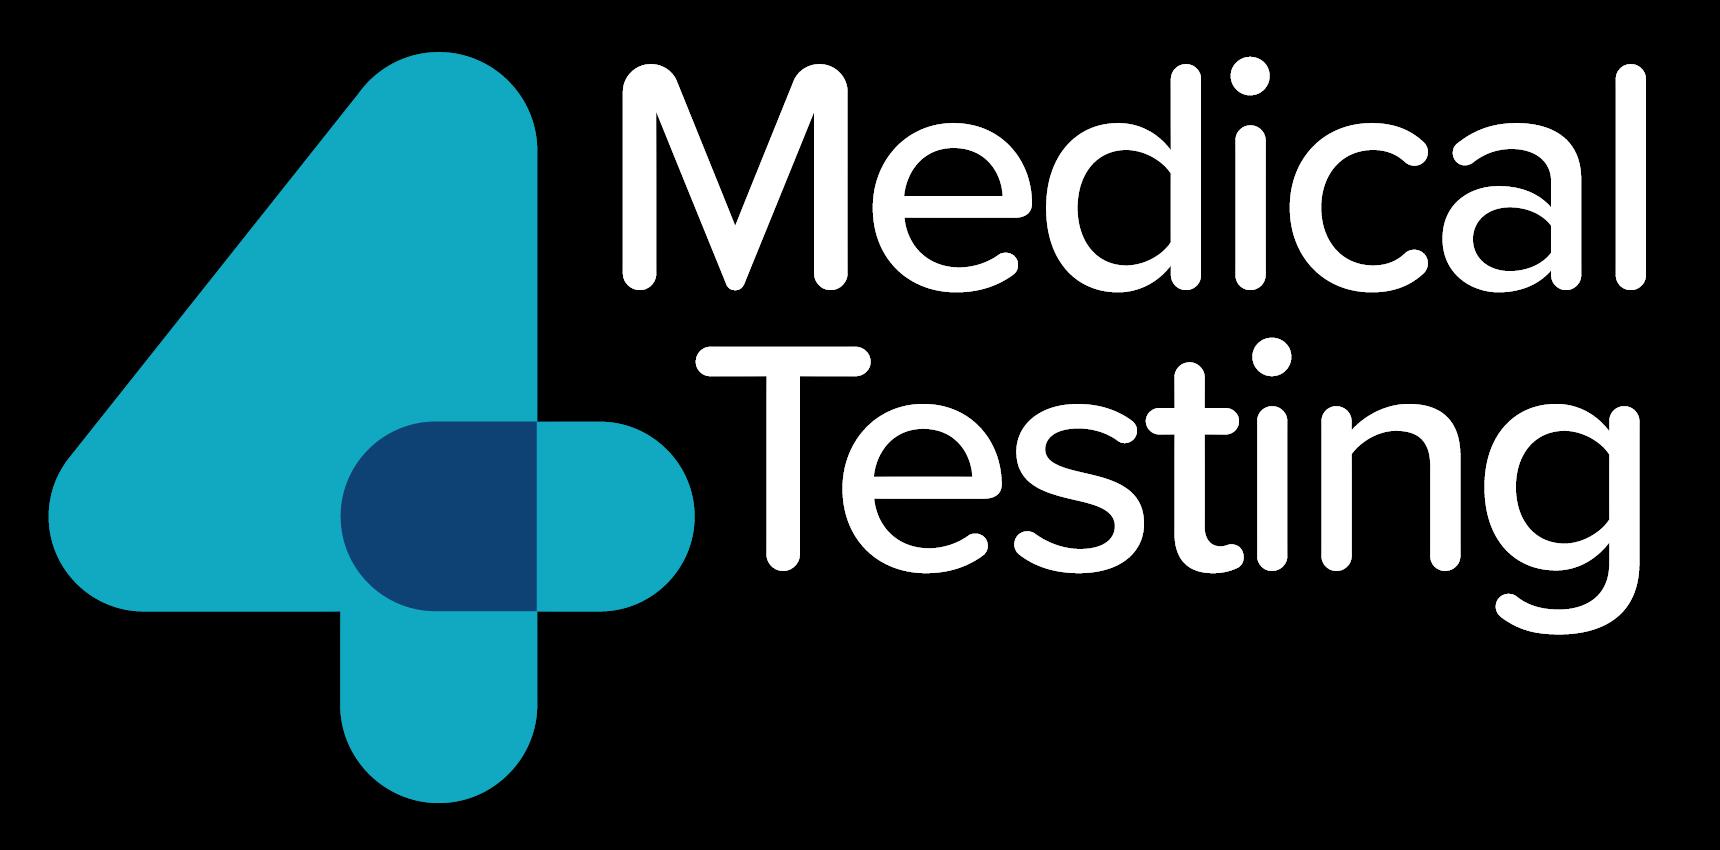 4 Medical Testing